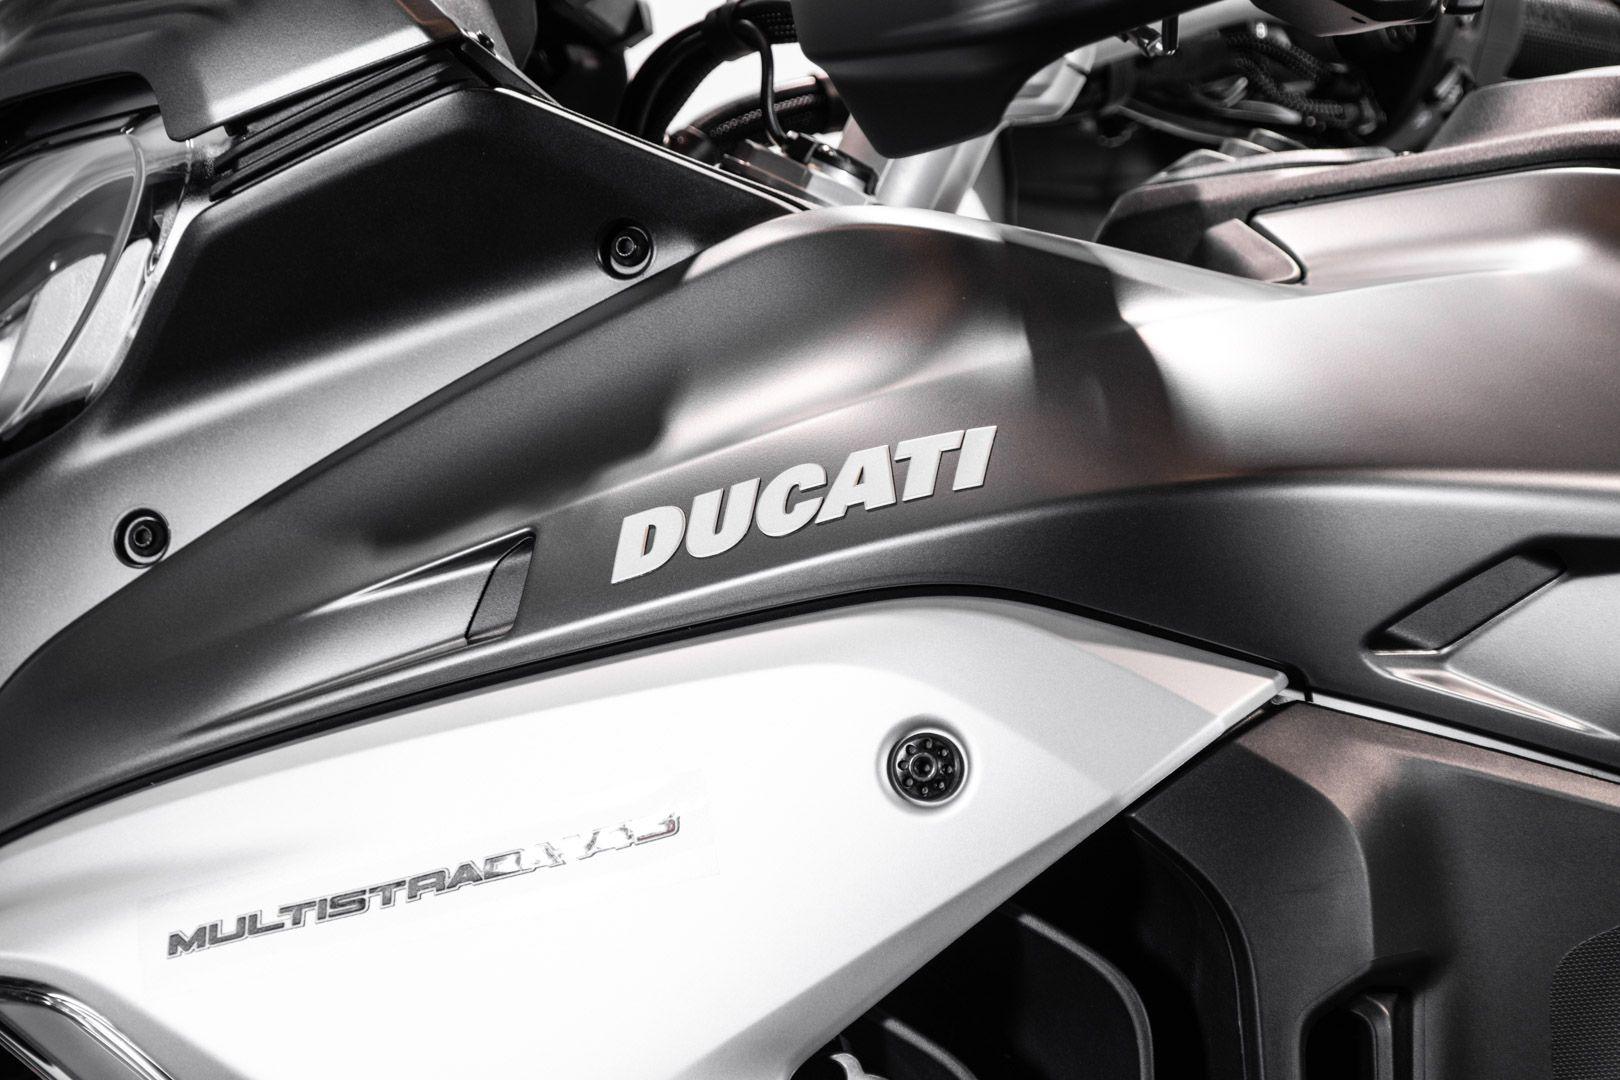 2021 Ducati MULTISTRADA V4 AVIATOR GREY FULL 84036